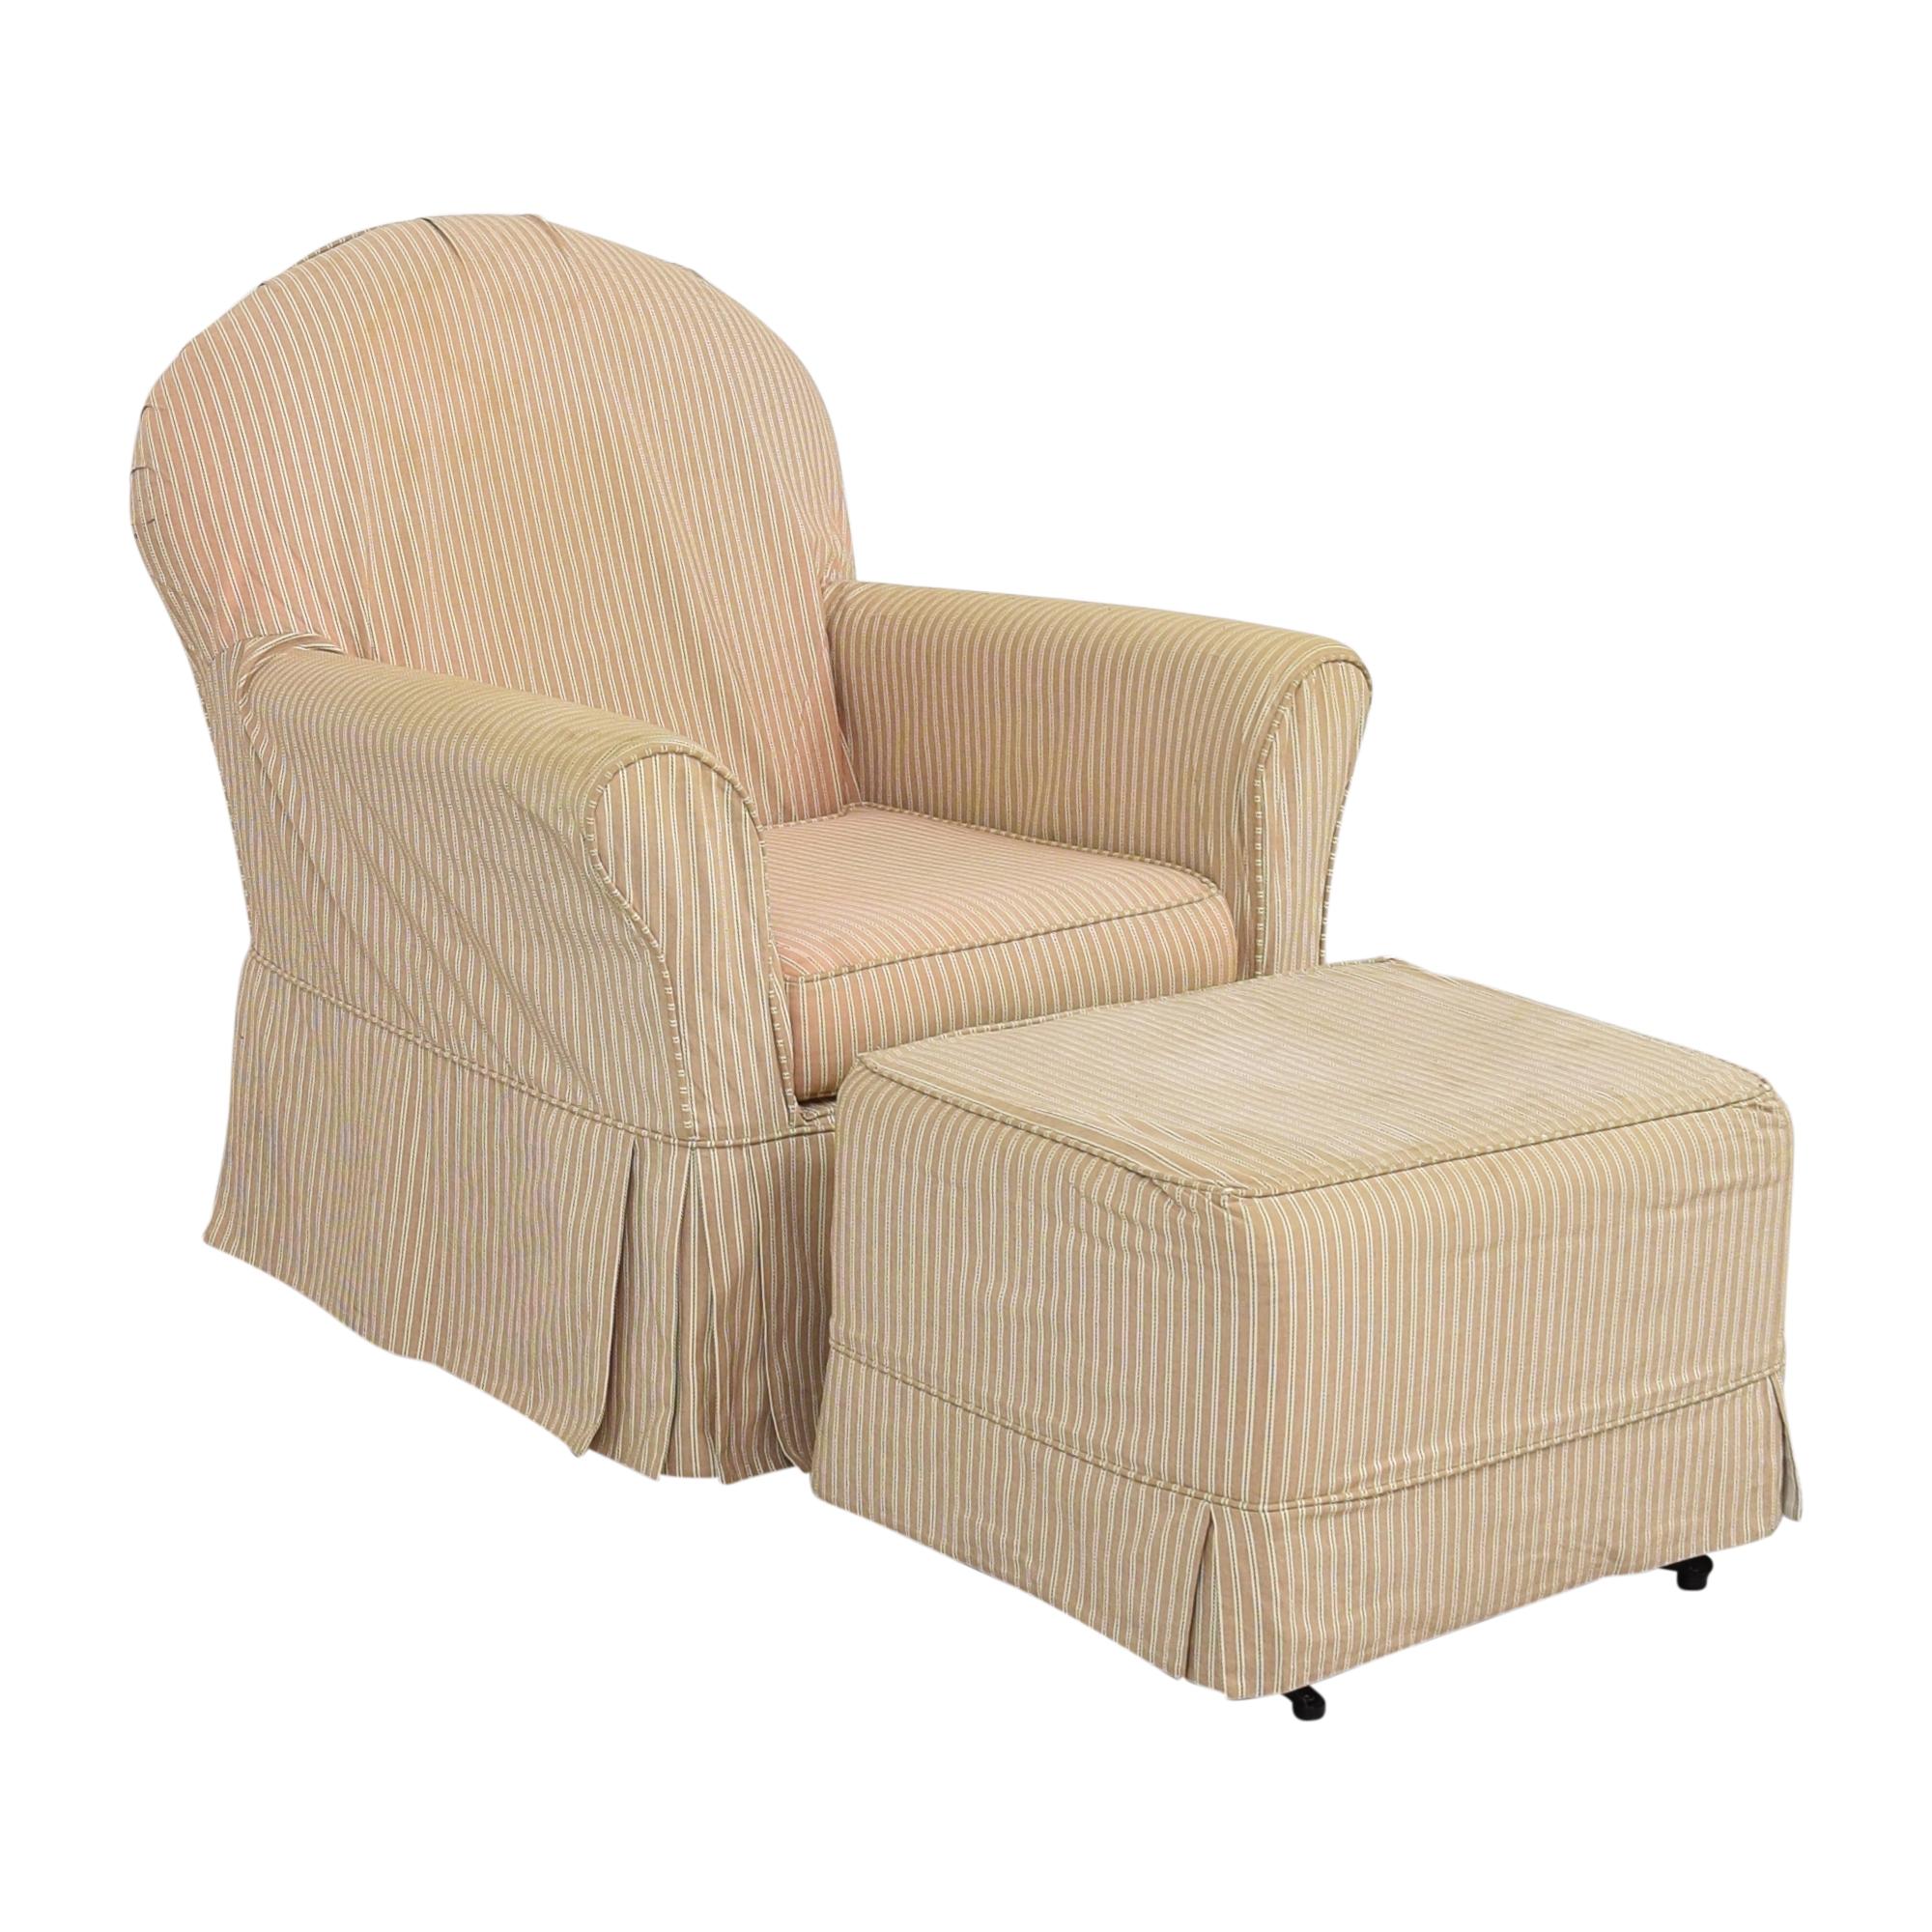 Little Castle Furniture Little Castle Furniture Slipcovered Royal Glider and Ottoman